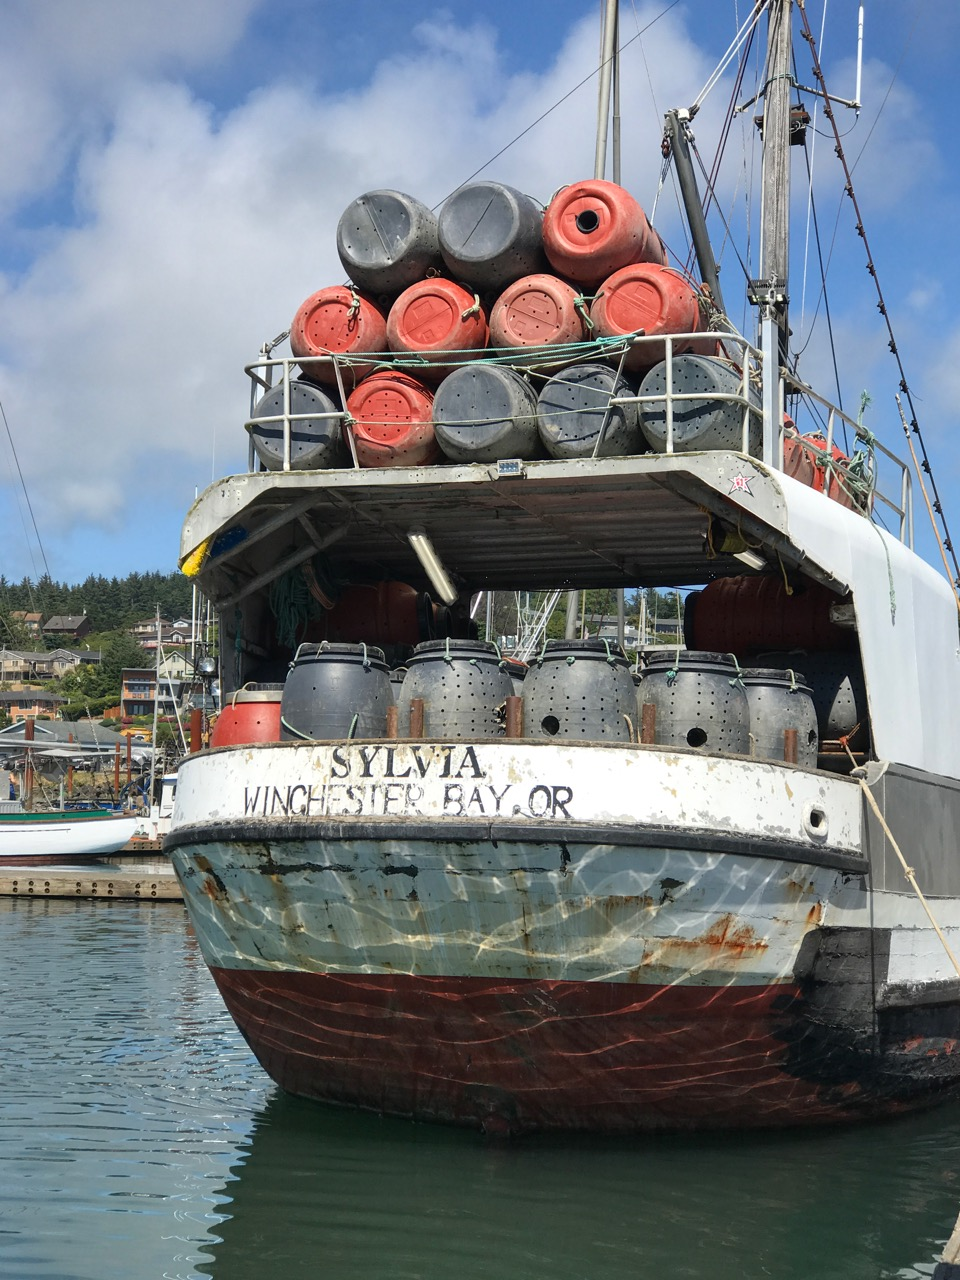 The Sylvia